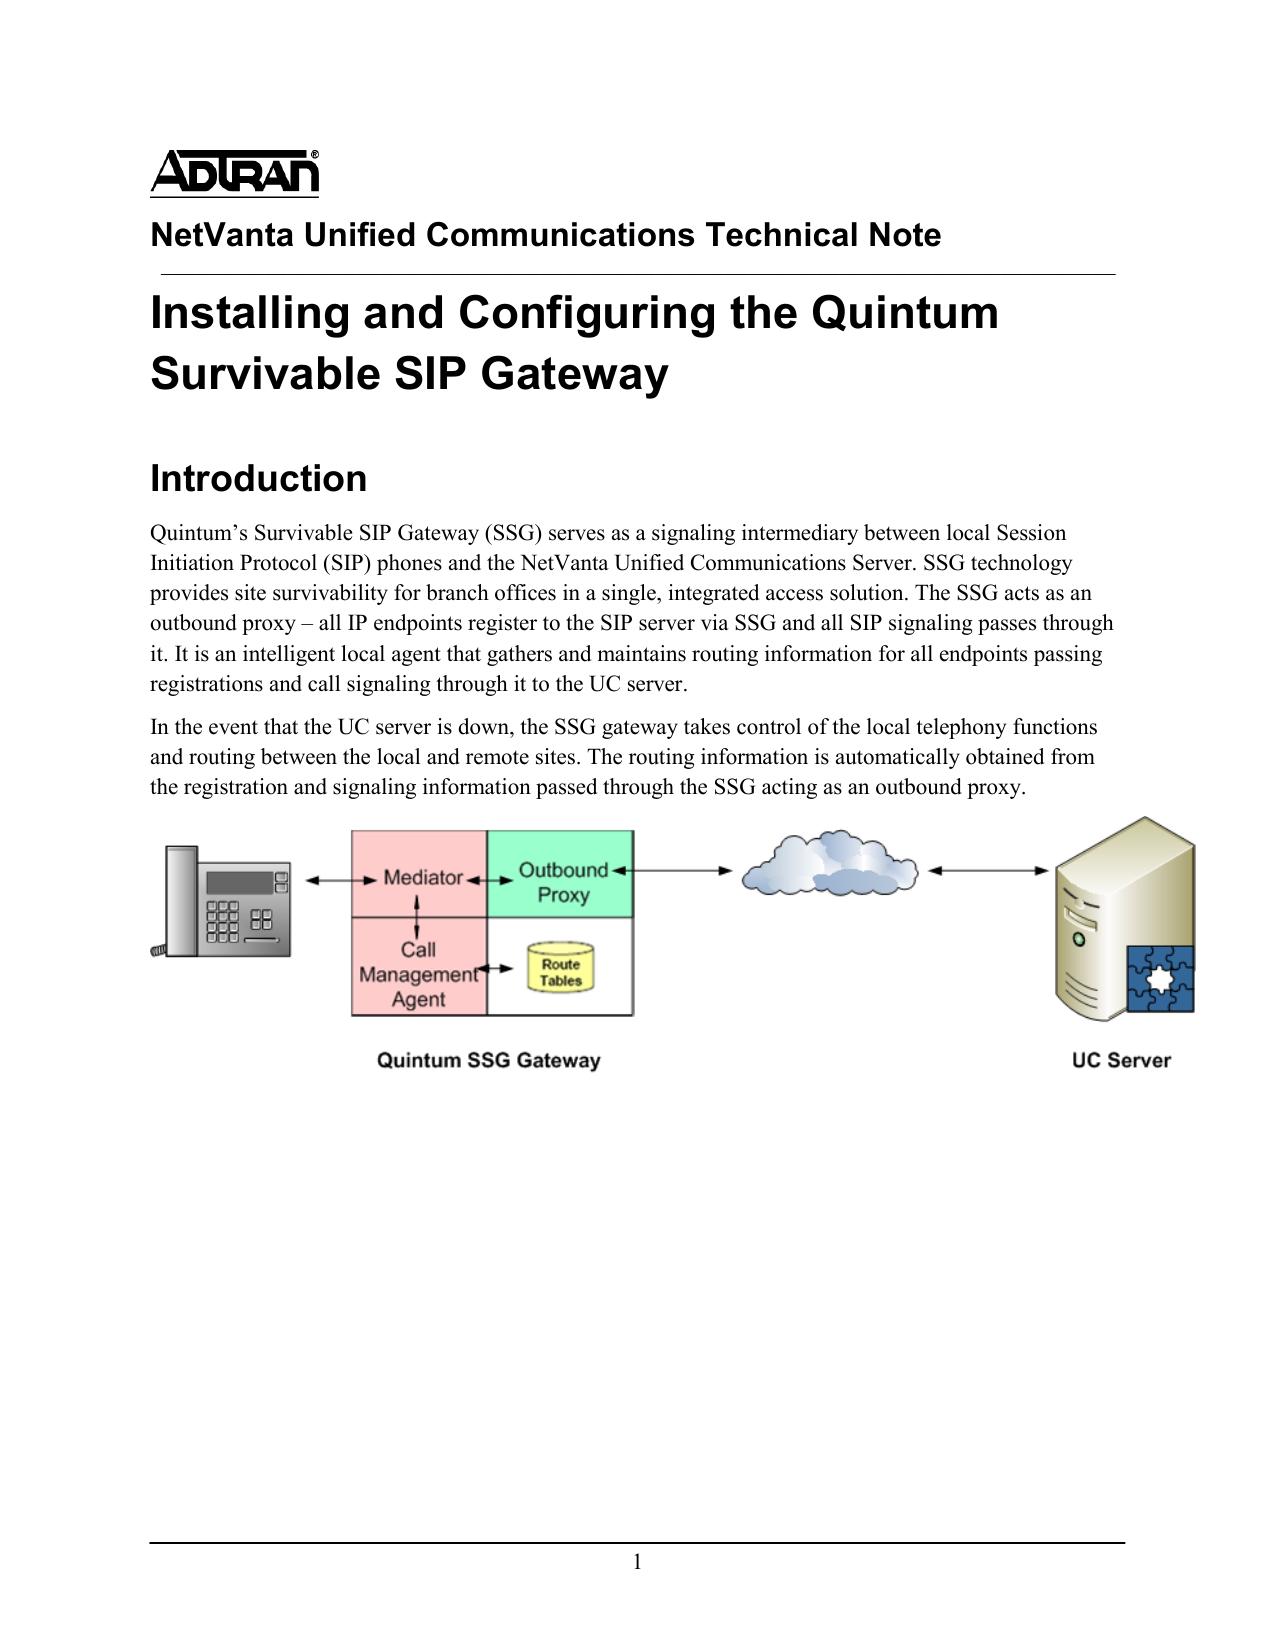 TN101 - Quintum Survivable SIP Gateway Installation and